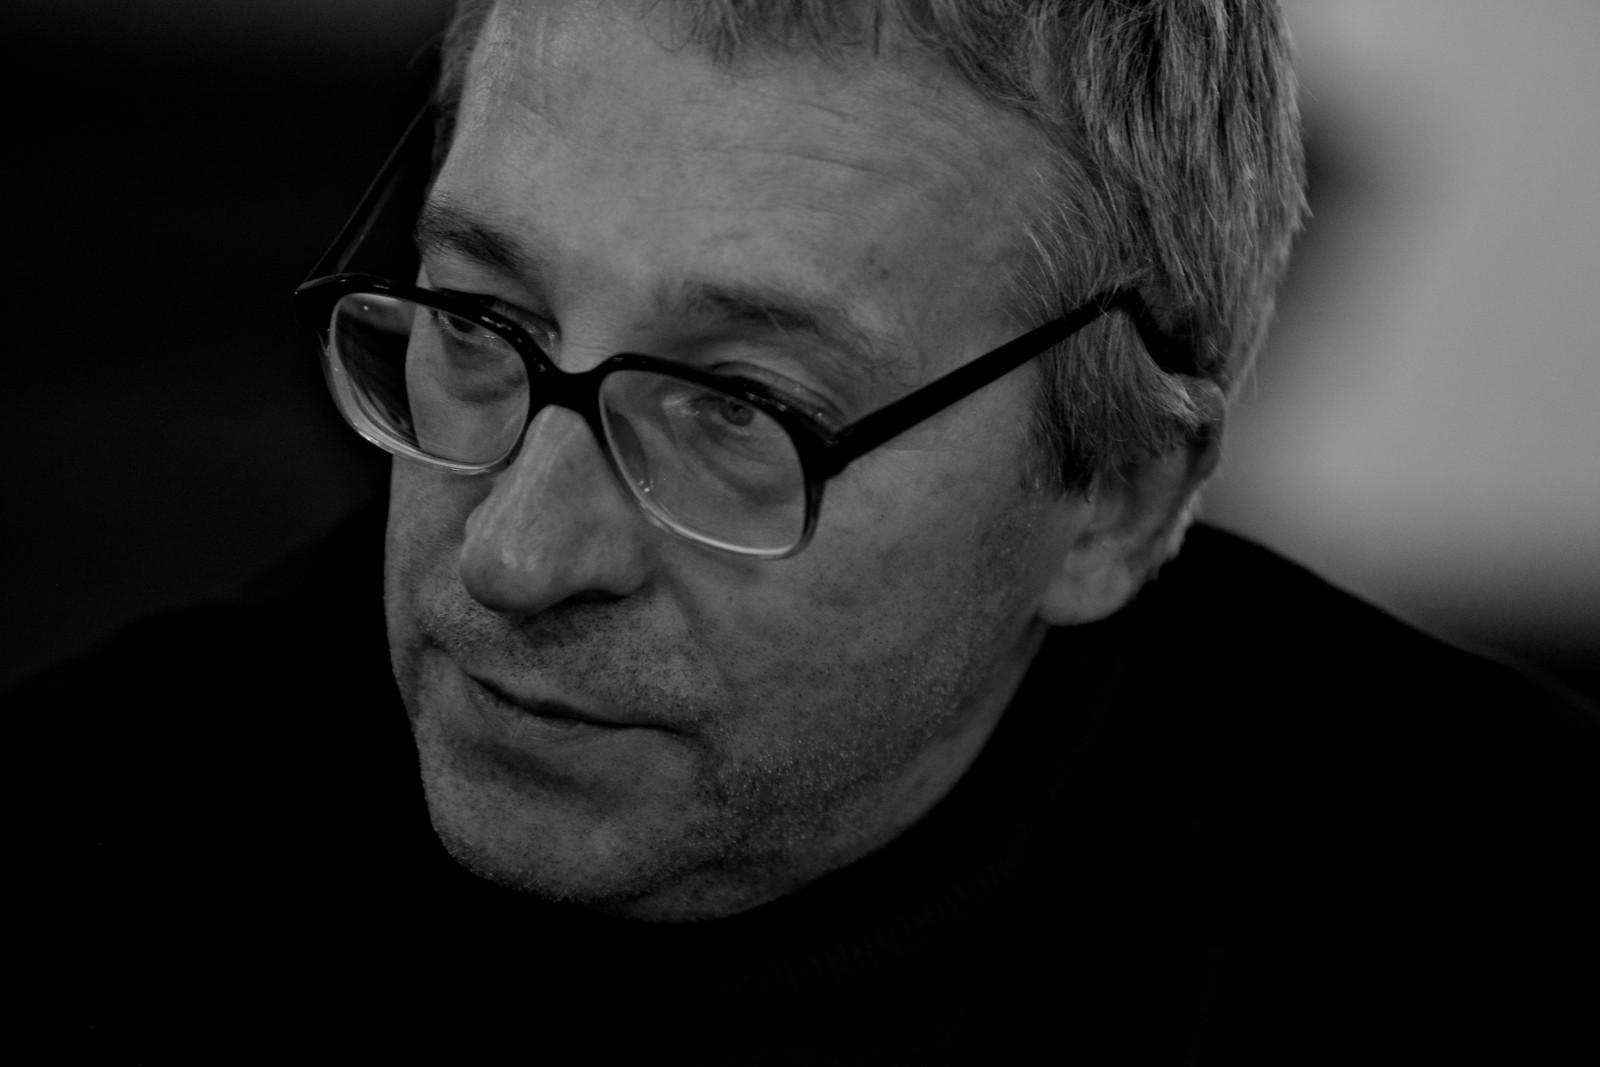 Artur Klinau © Hartwig Klappert